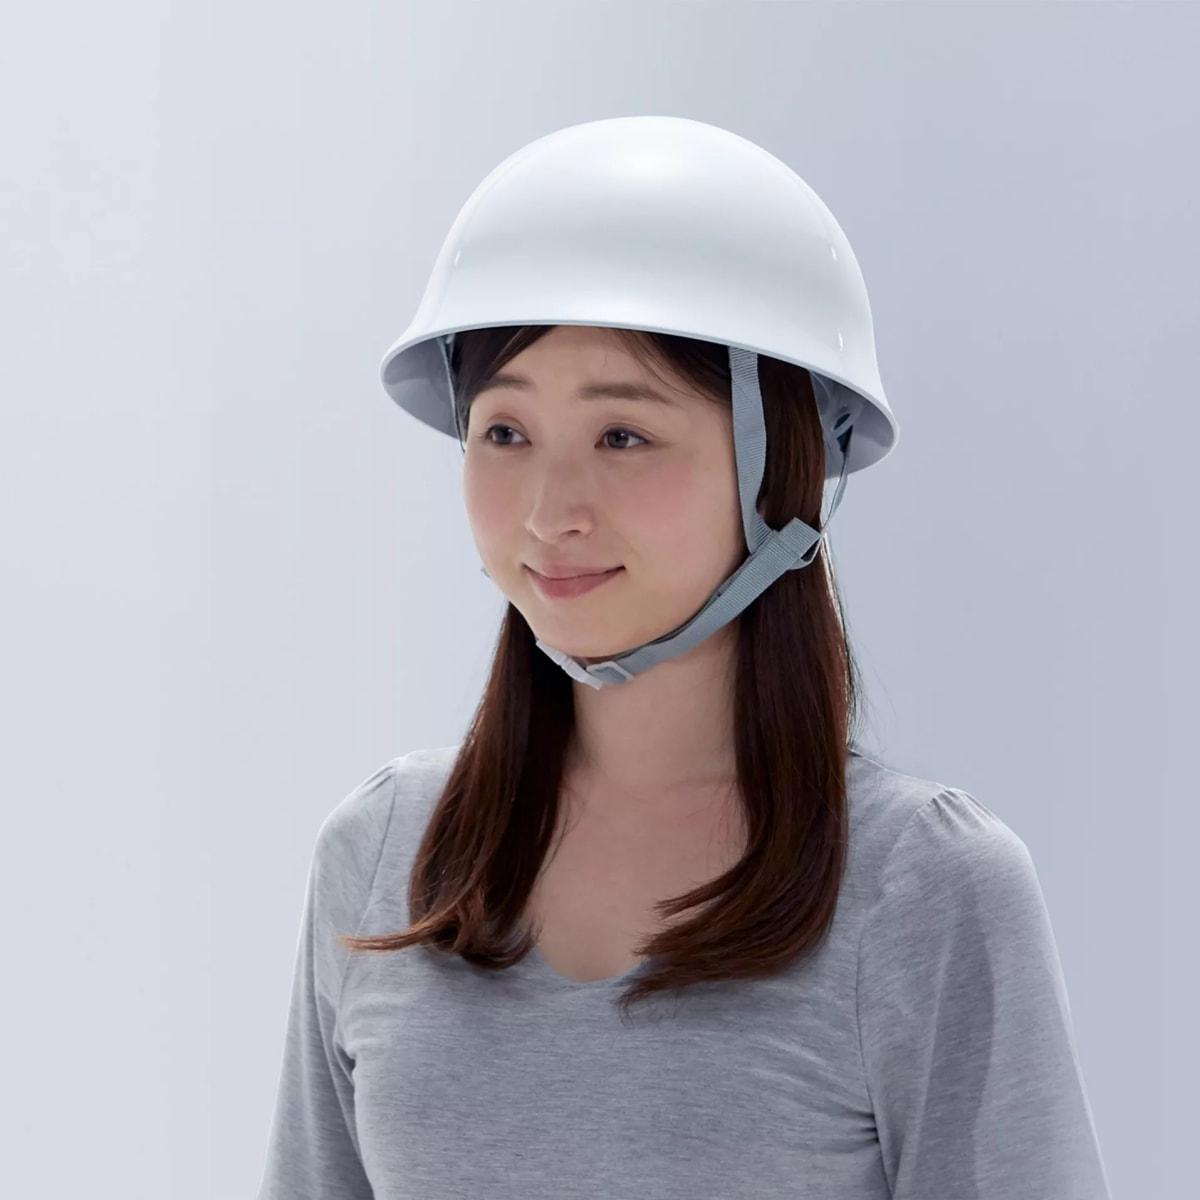 Girls wearing the +MET helmet